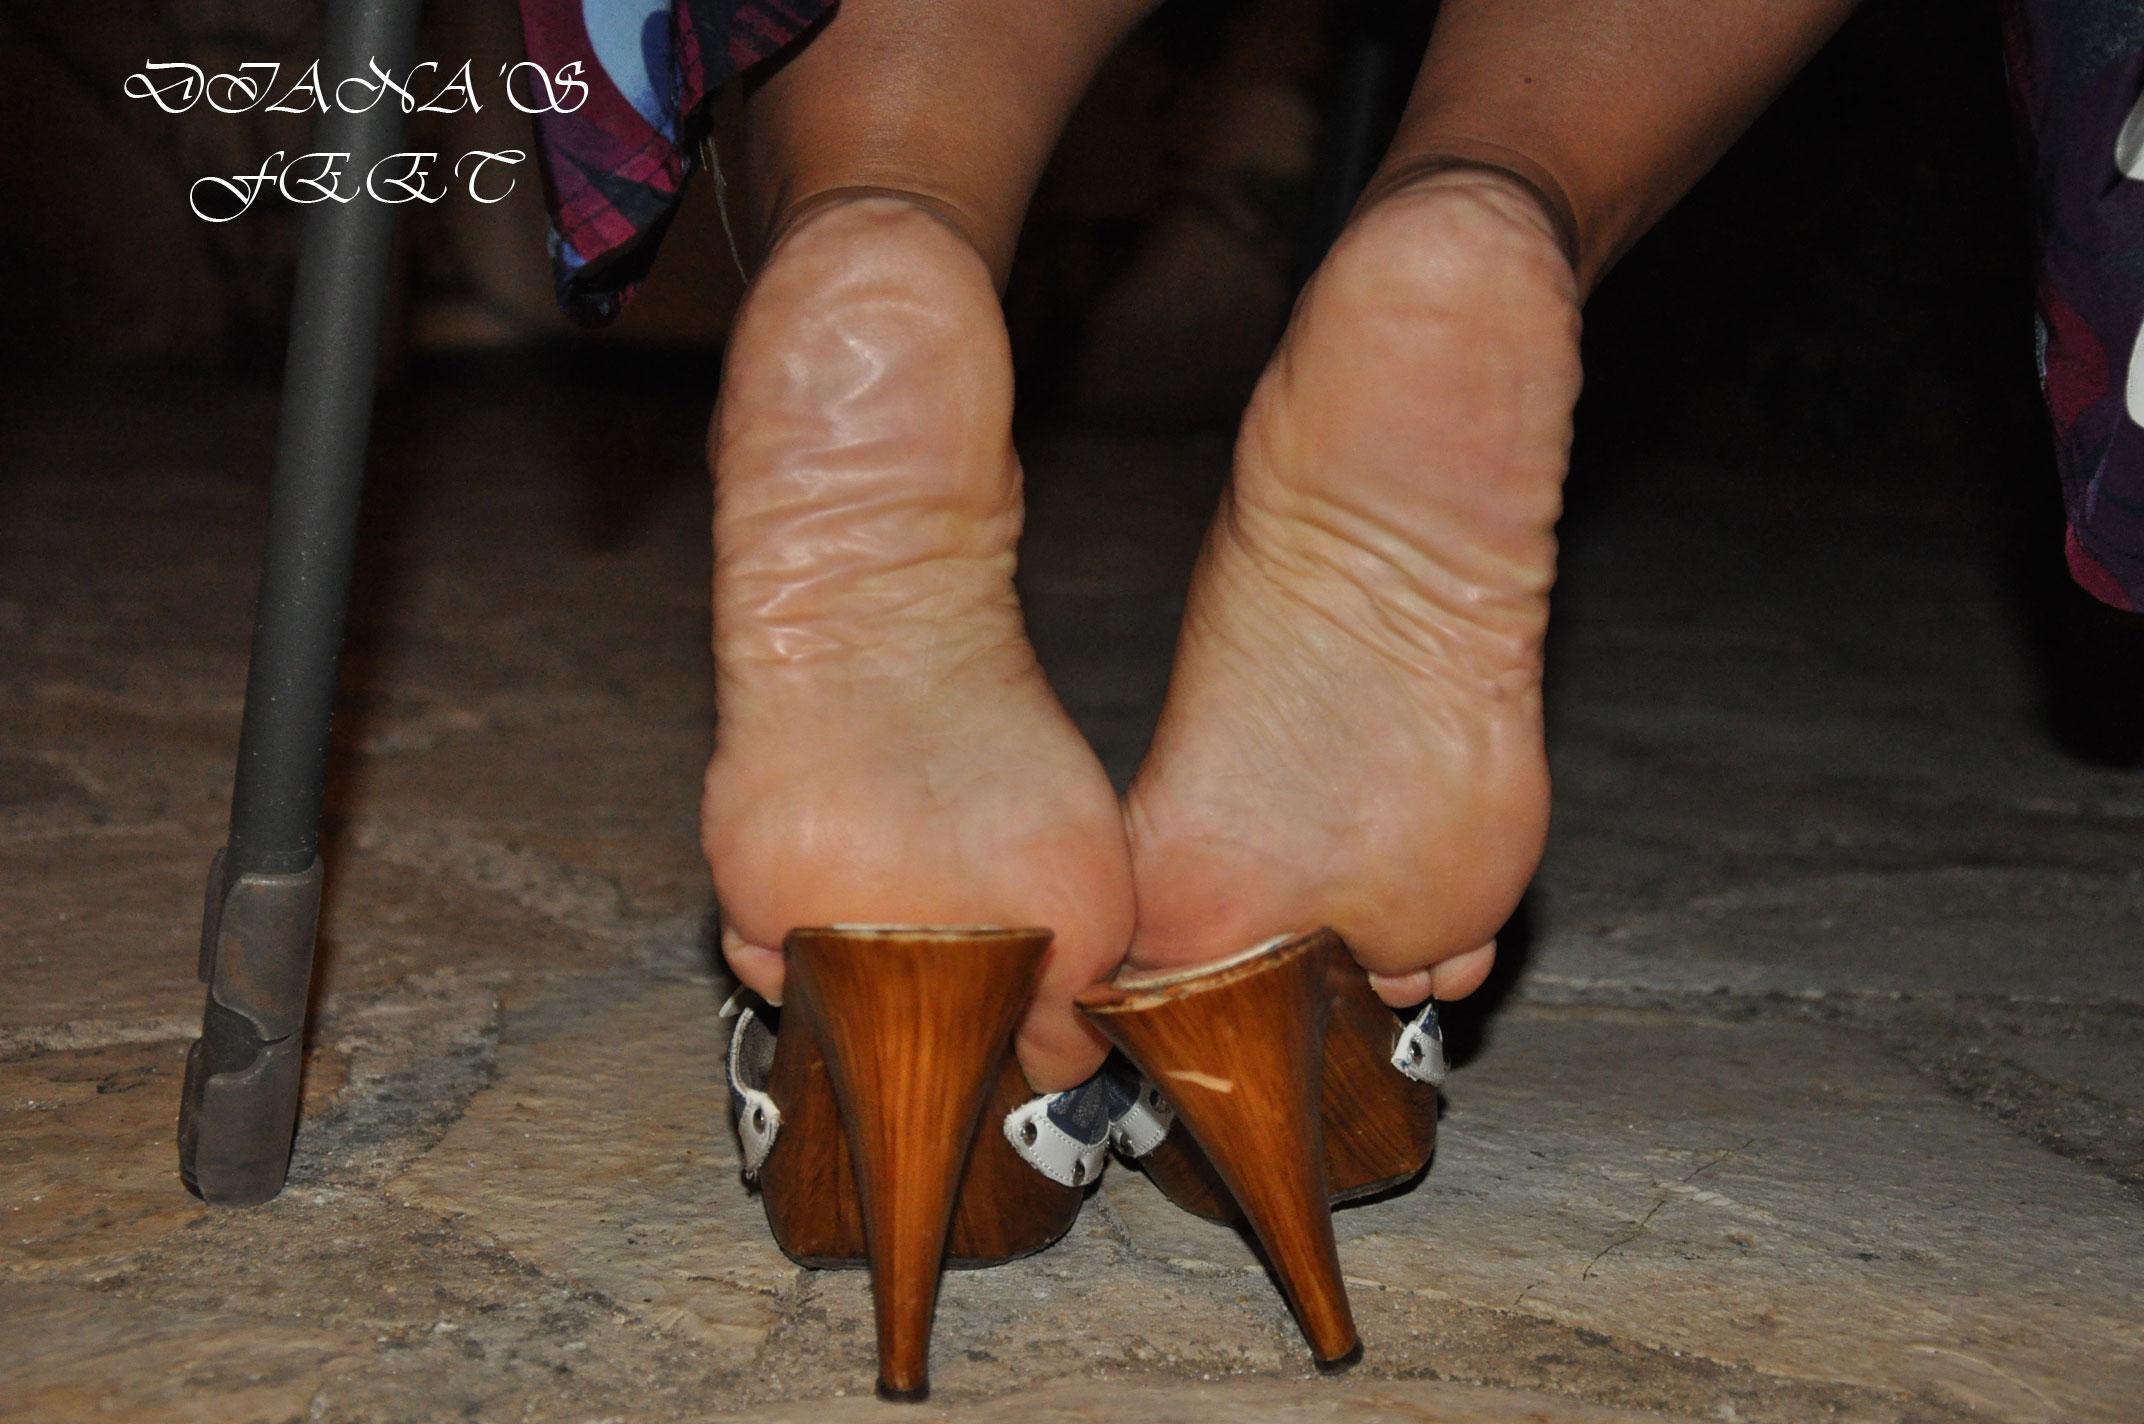 Diana 's feet 171115102729793606